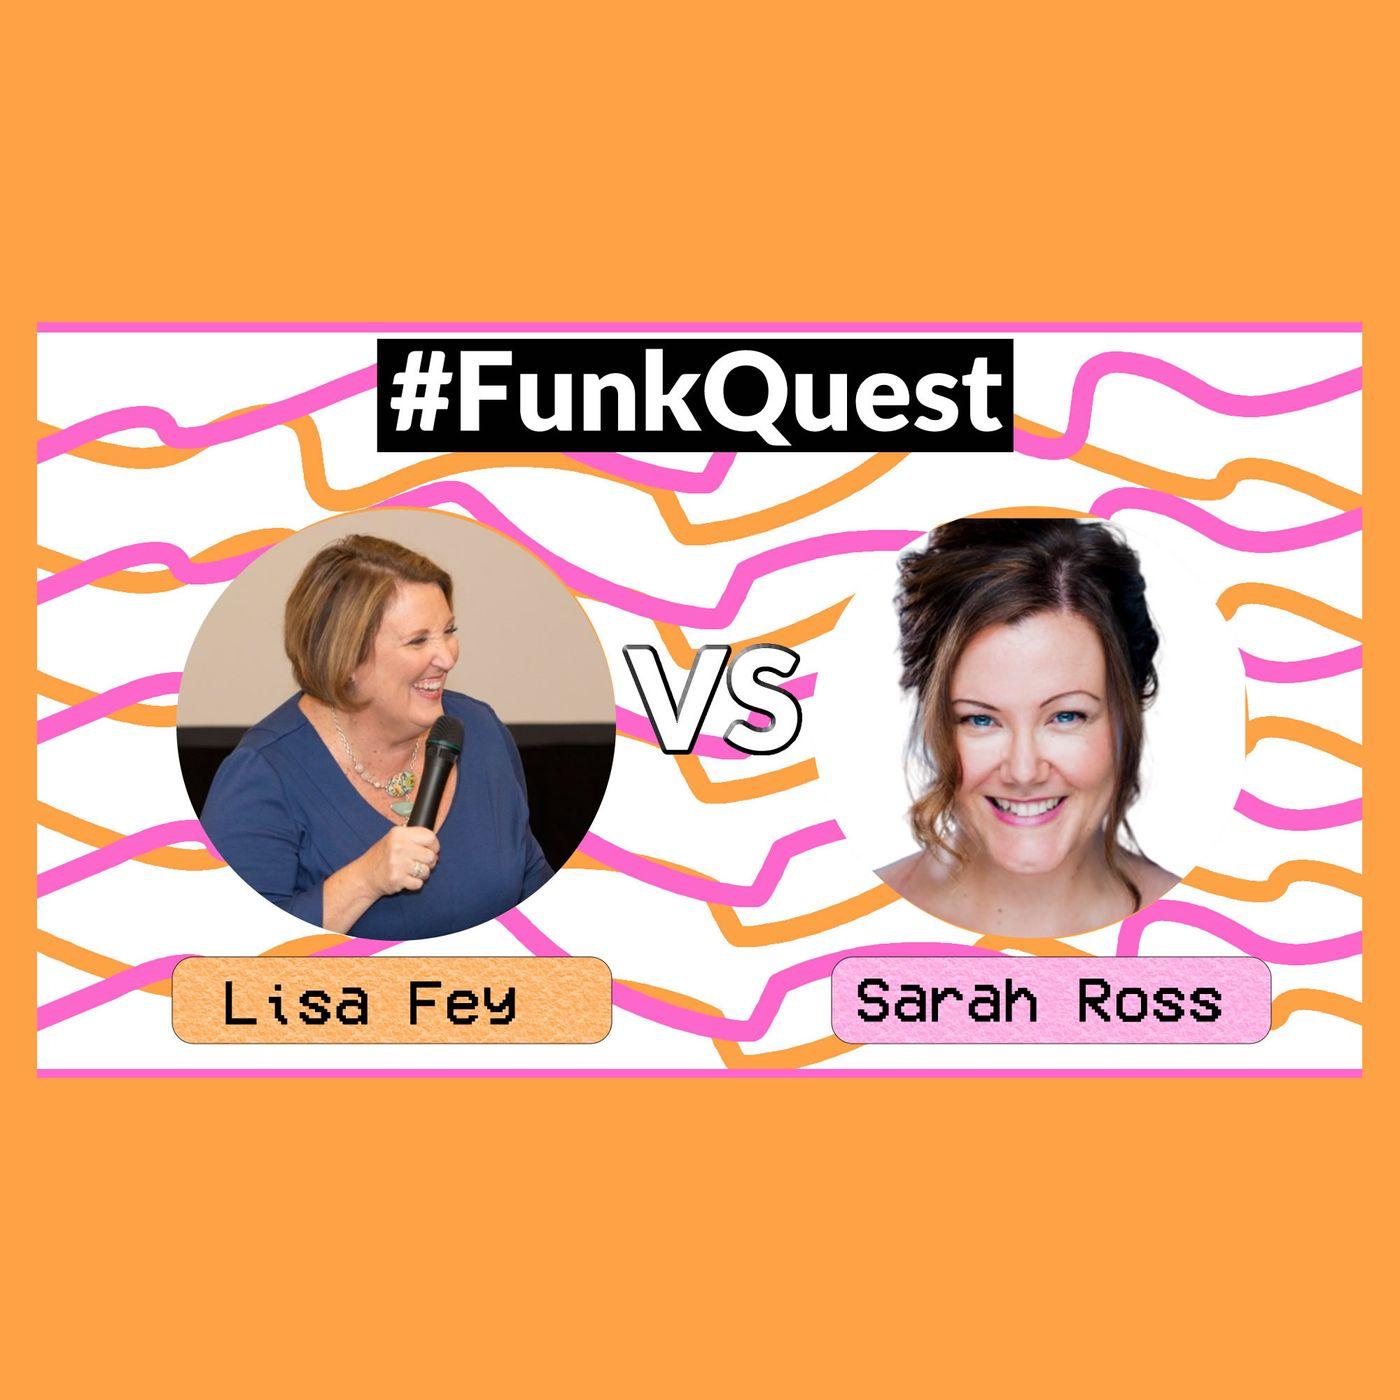 FunkQuest - Season 3 - Episode 2 - Lisa Fey v Sarah Ross